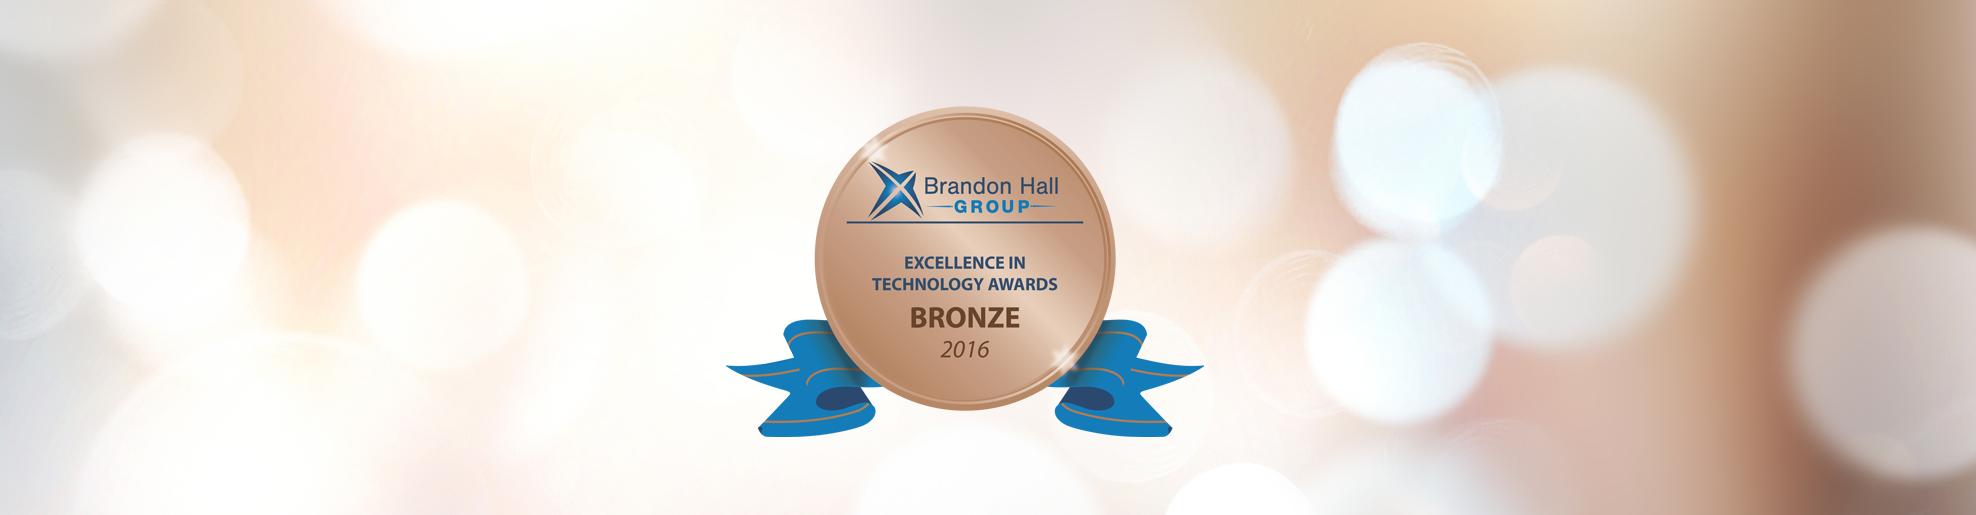 BHG-Bronze-4.png